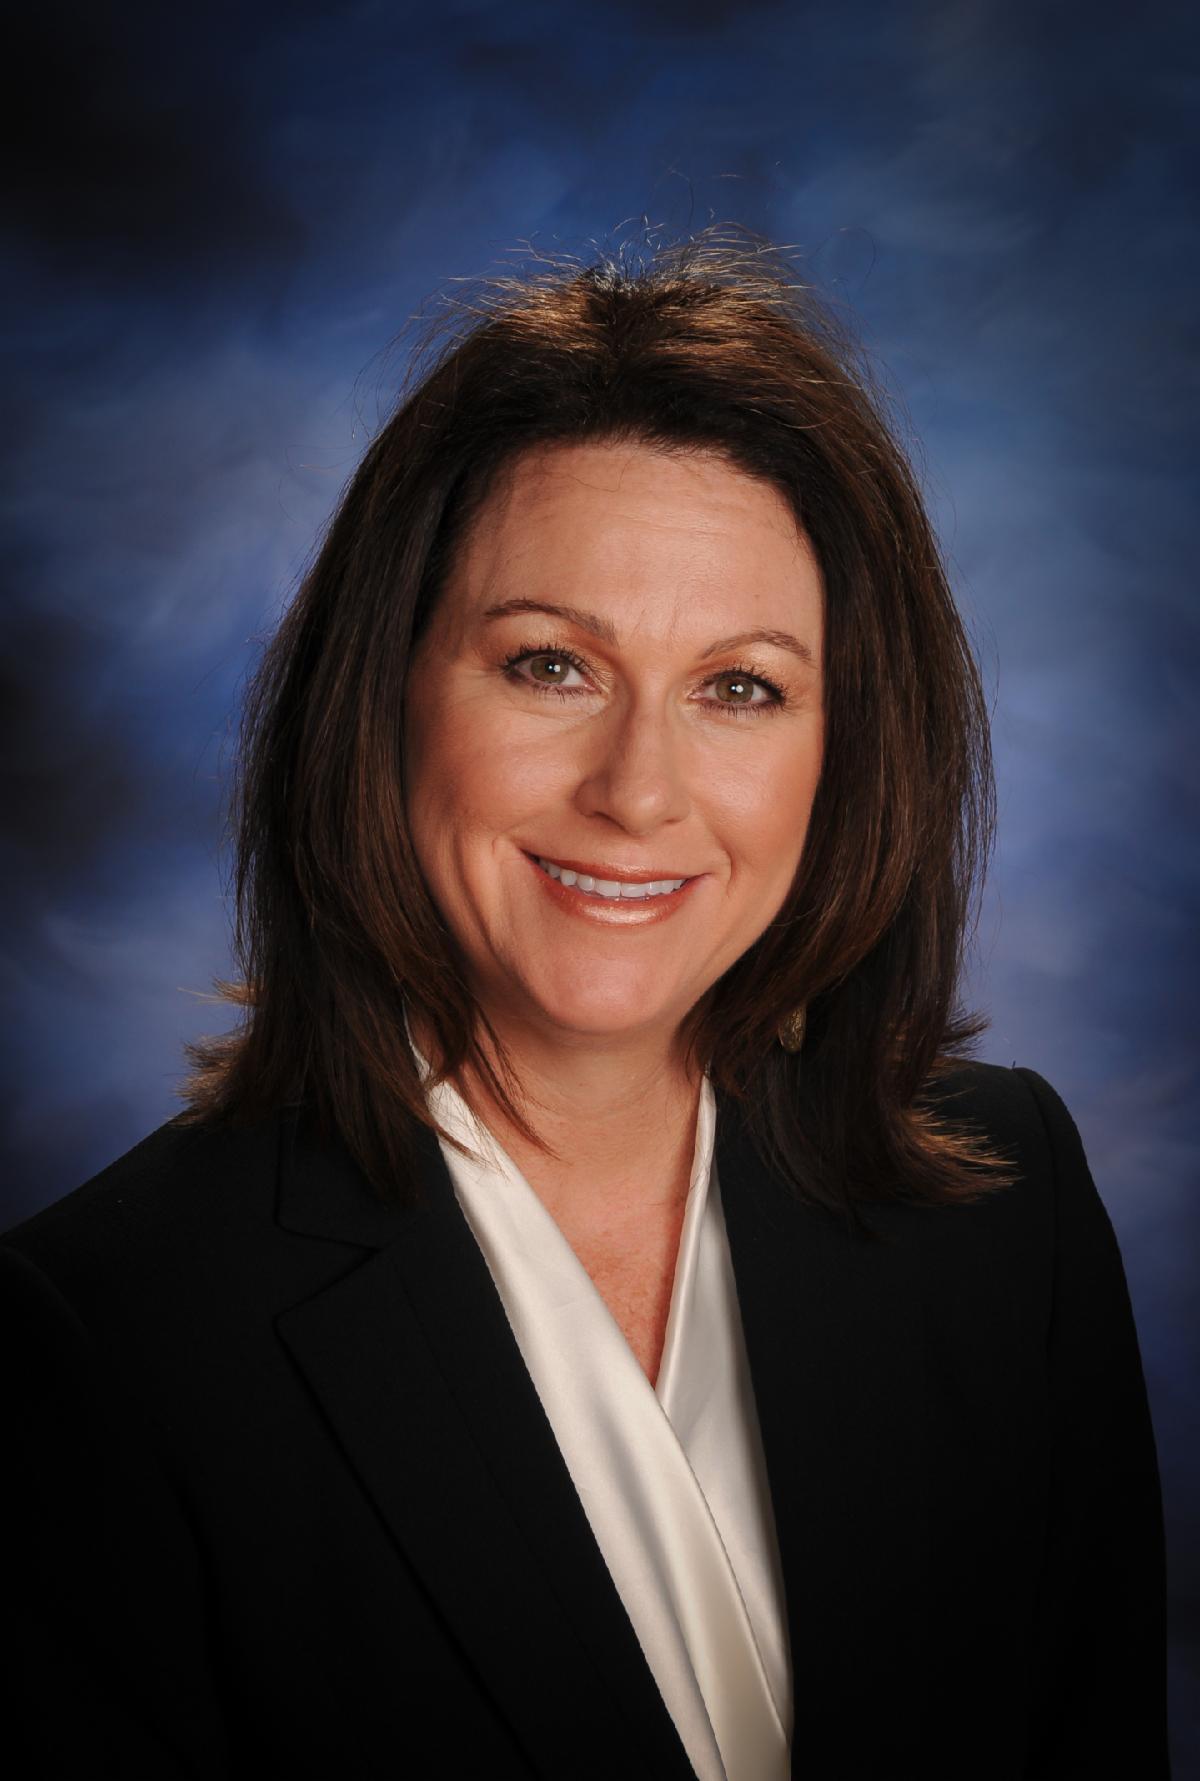 Professional Photo of Sherri Bays Superintendent